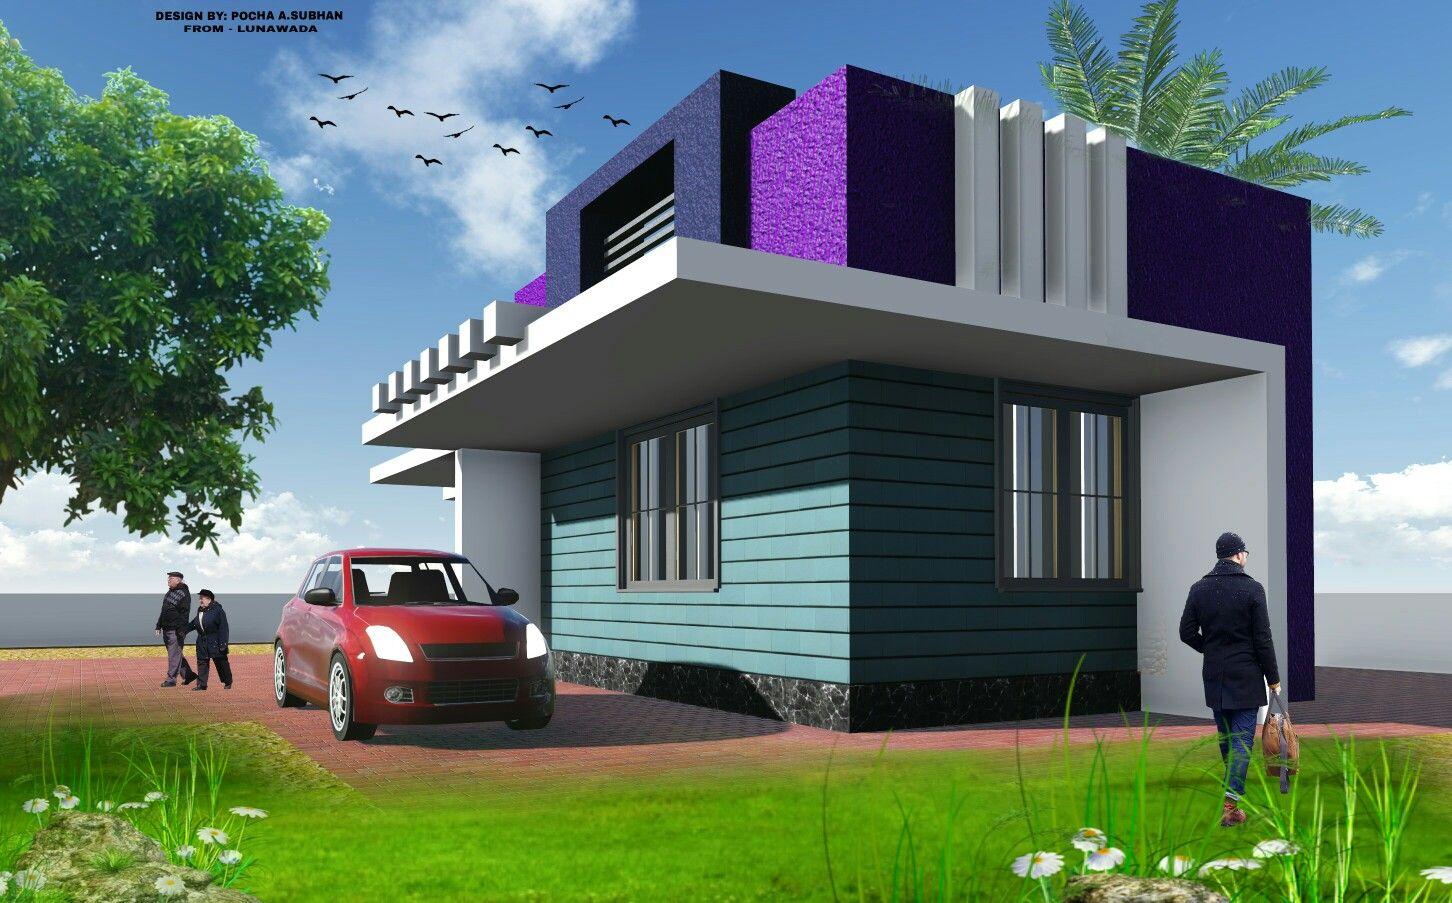 indian house design elevation by pocha a subhan a subhanpocha